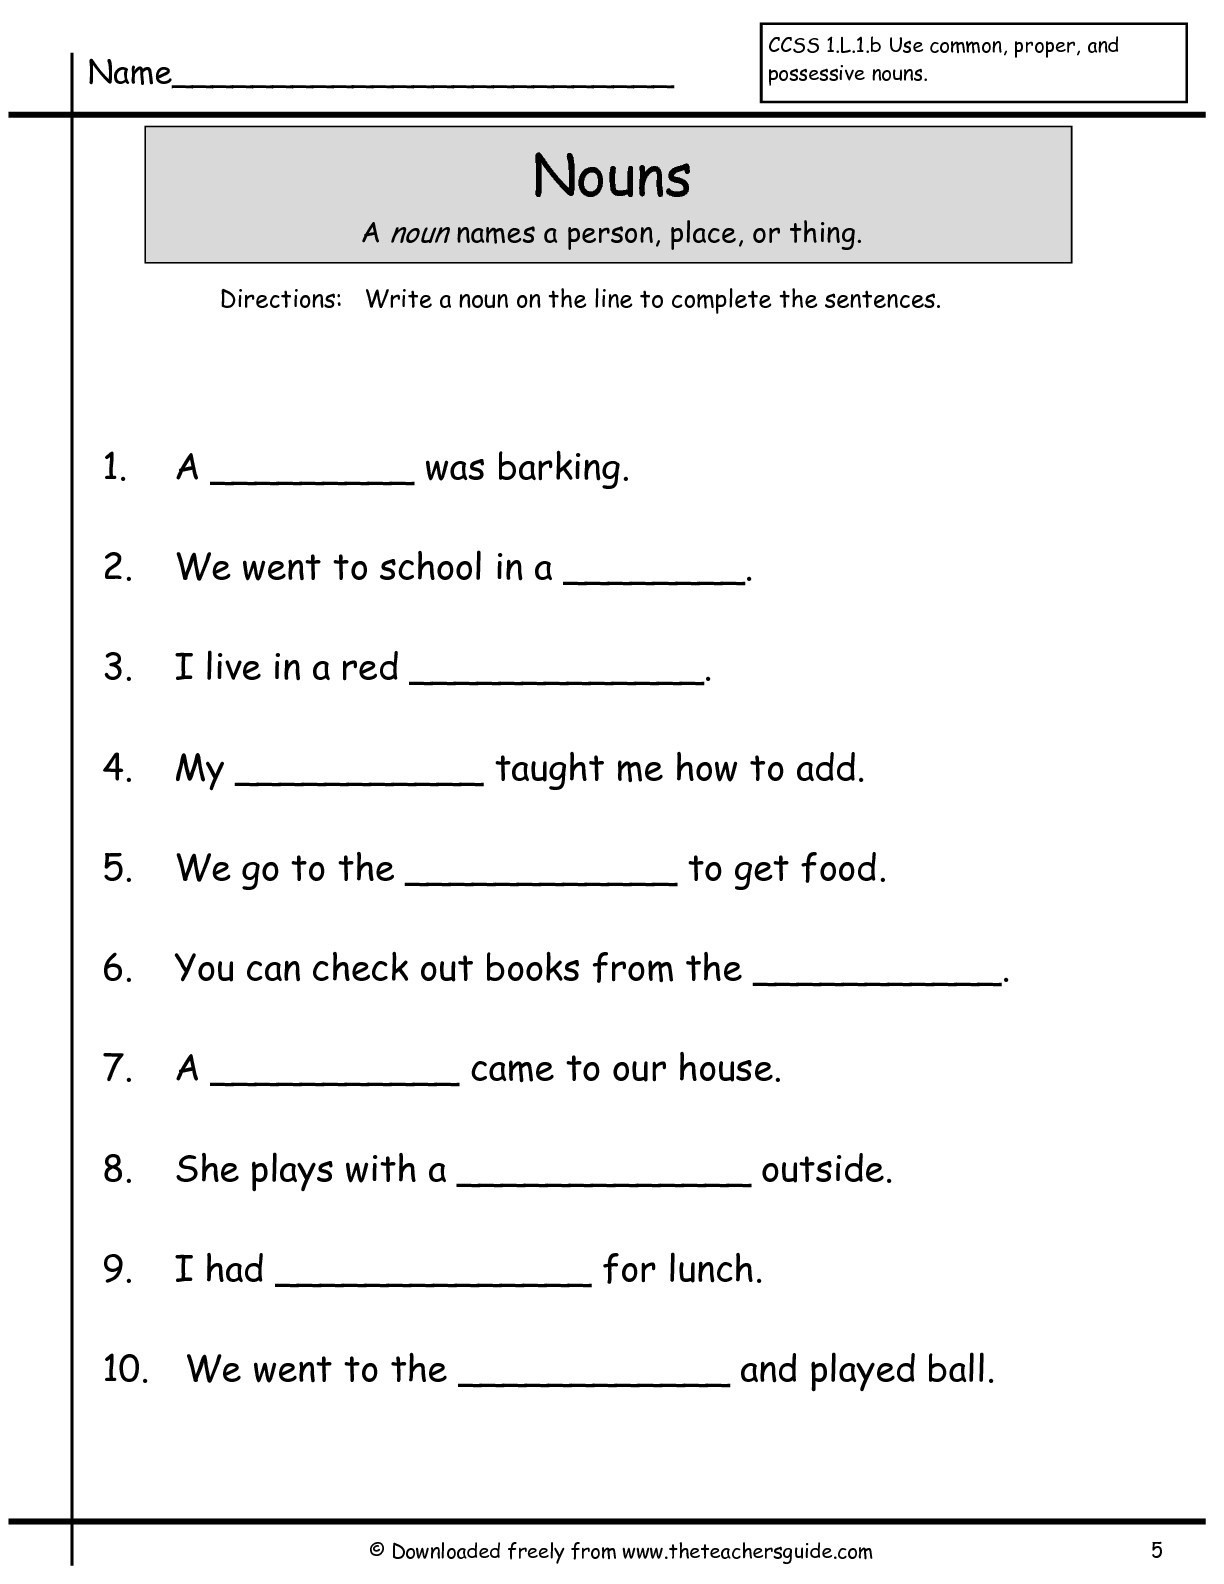 3rd Grade social Studies Worksheet social Stu First Grade Worksheets Printable and Stu S 1st